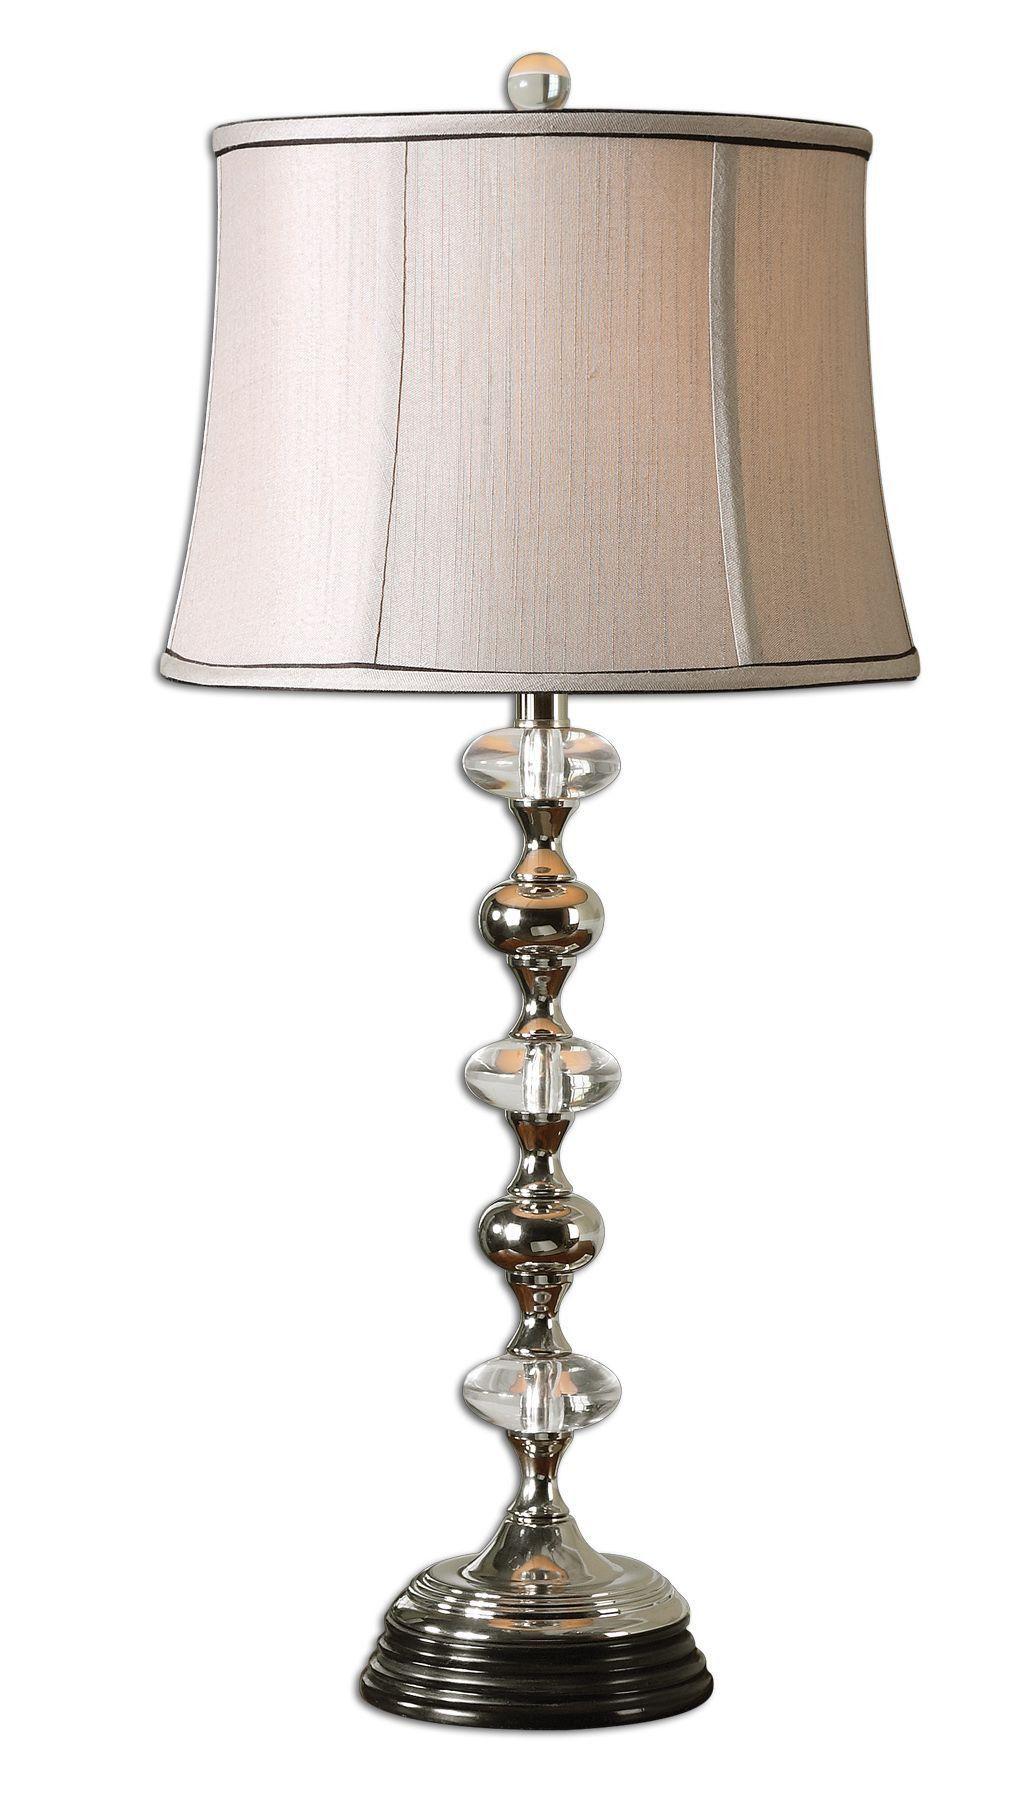 Uttermost Morgana Table Lamp - 26821